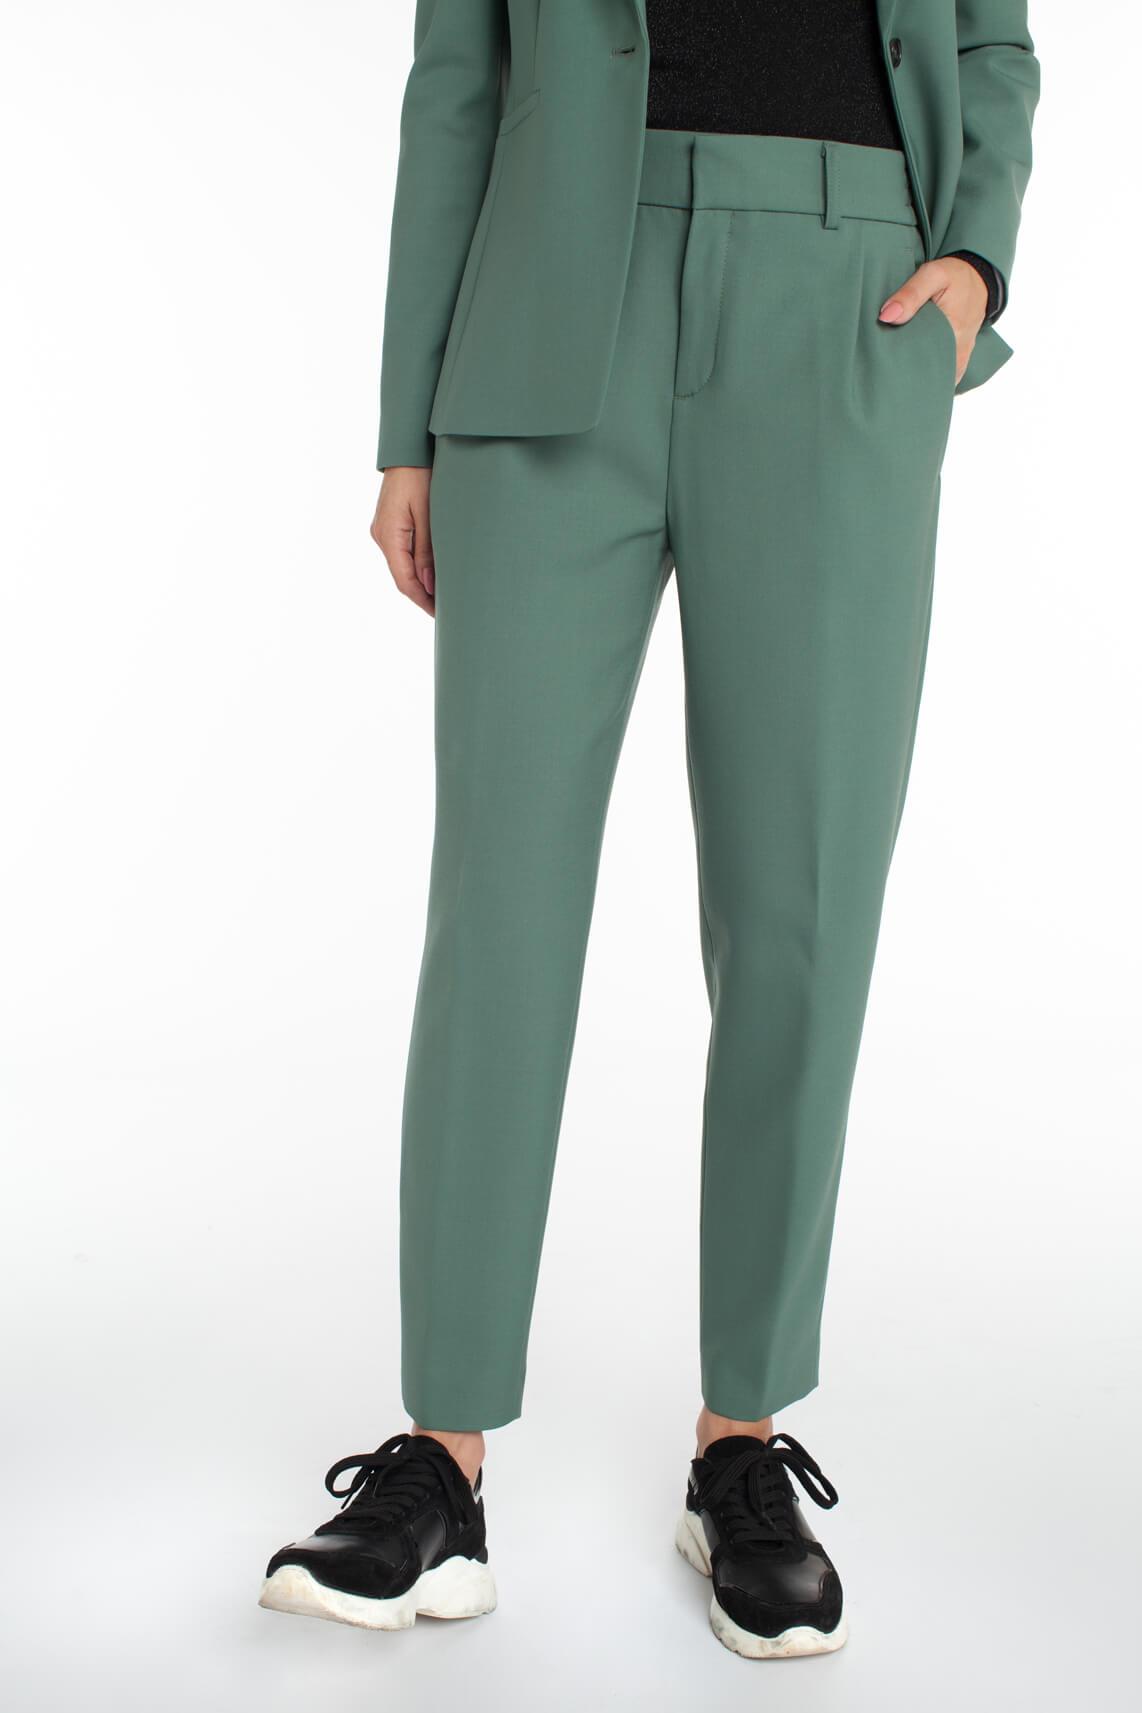 Drykorn Dames Find pantalon groen